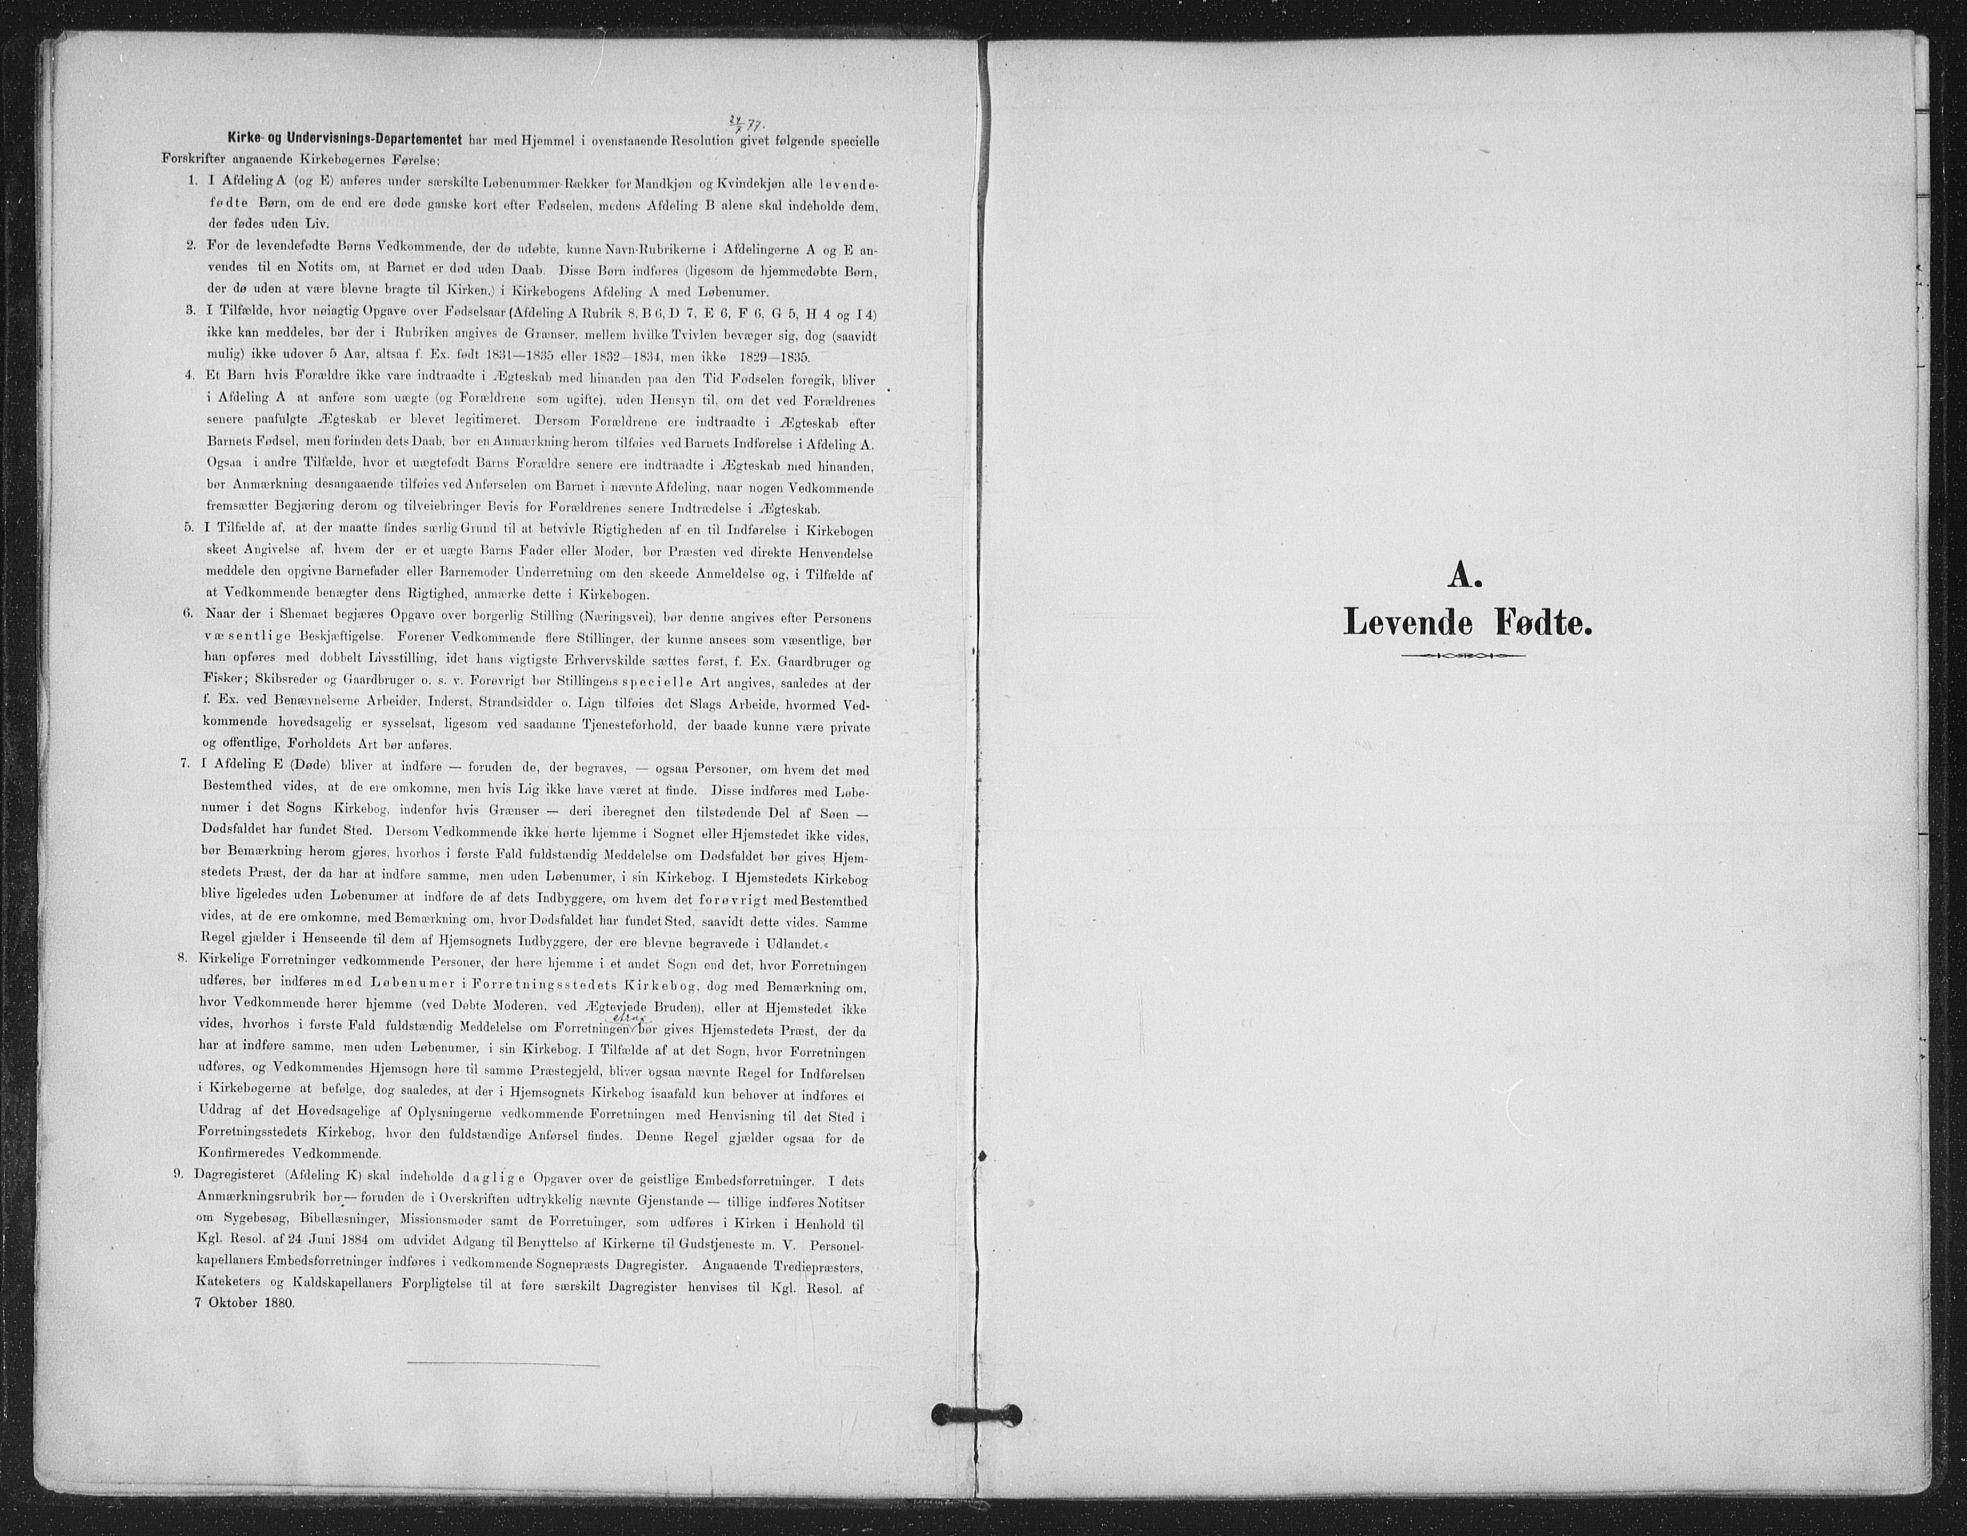 SAT, Ministerialprotokoller, klokkerbøker og fødselsregistre - Nordland, 843/L0628: Ministerialbok nr. 843A03, 1889-1907